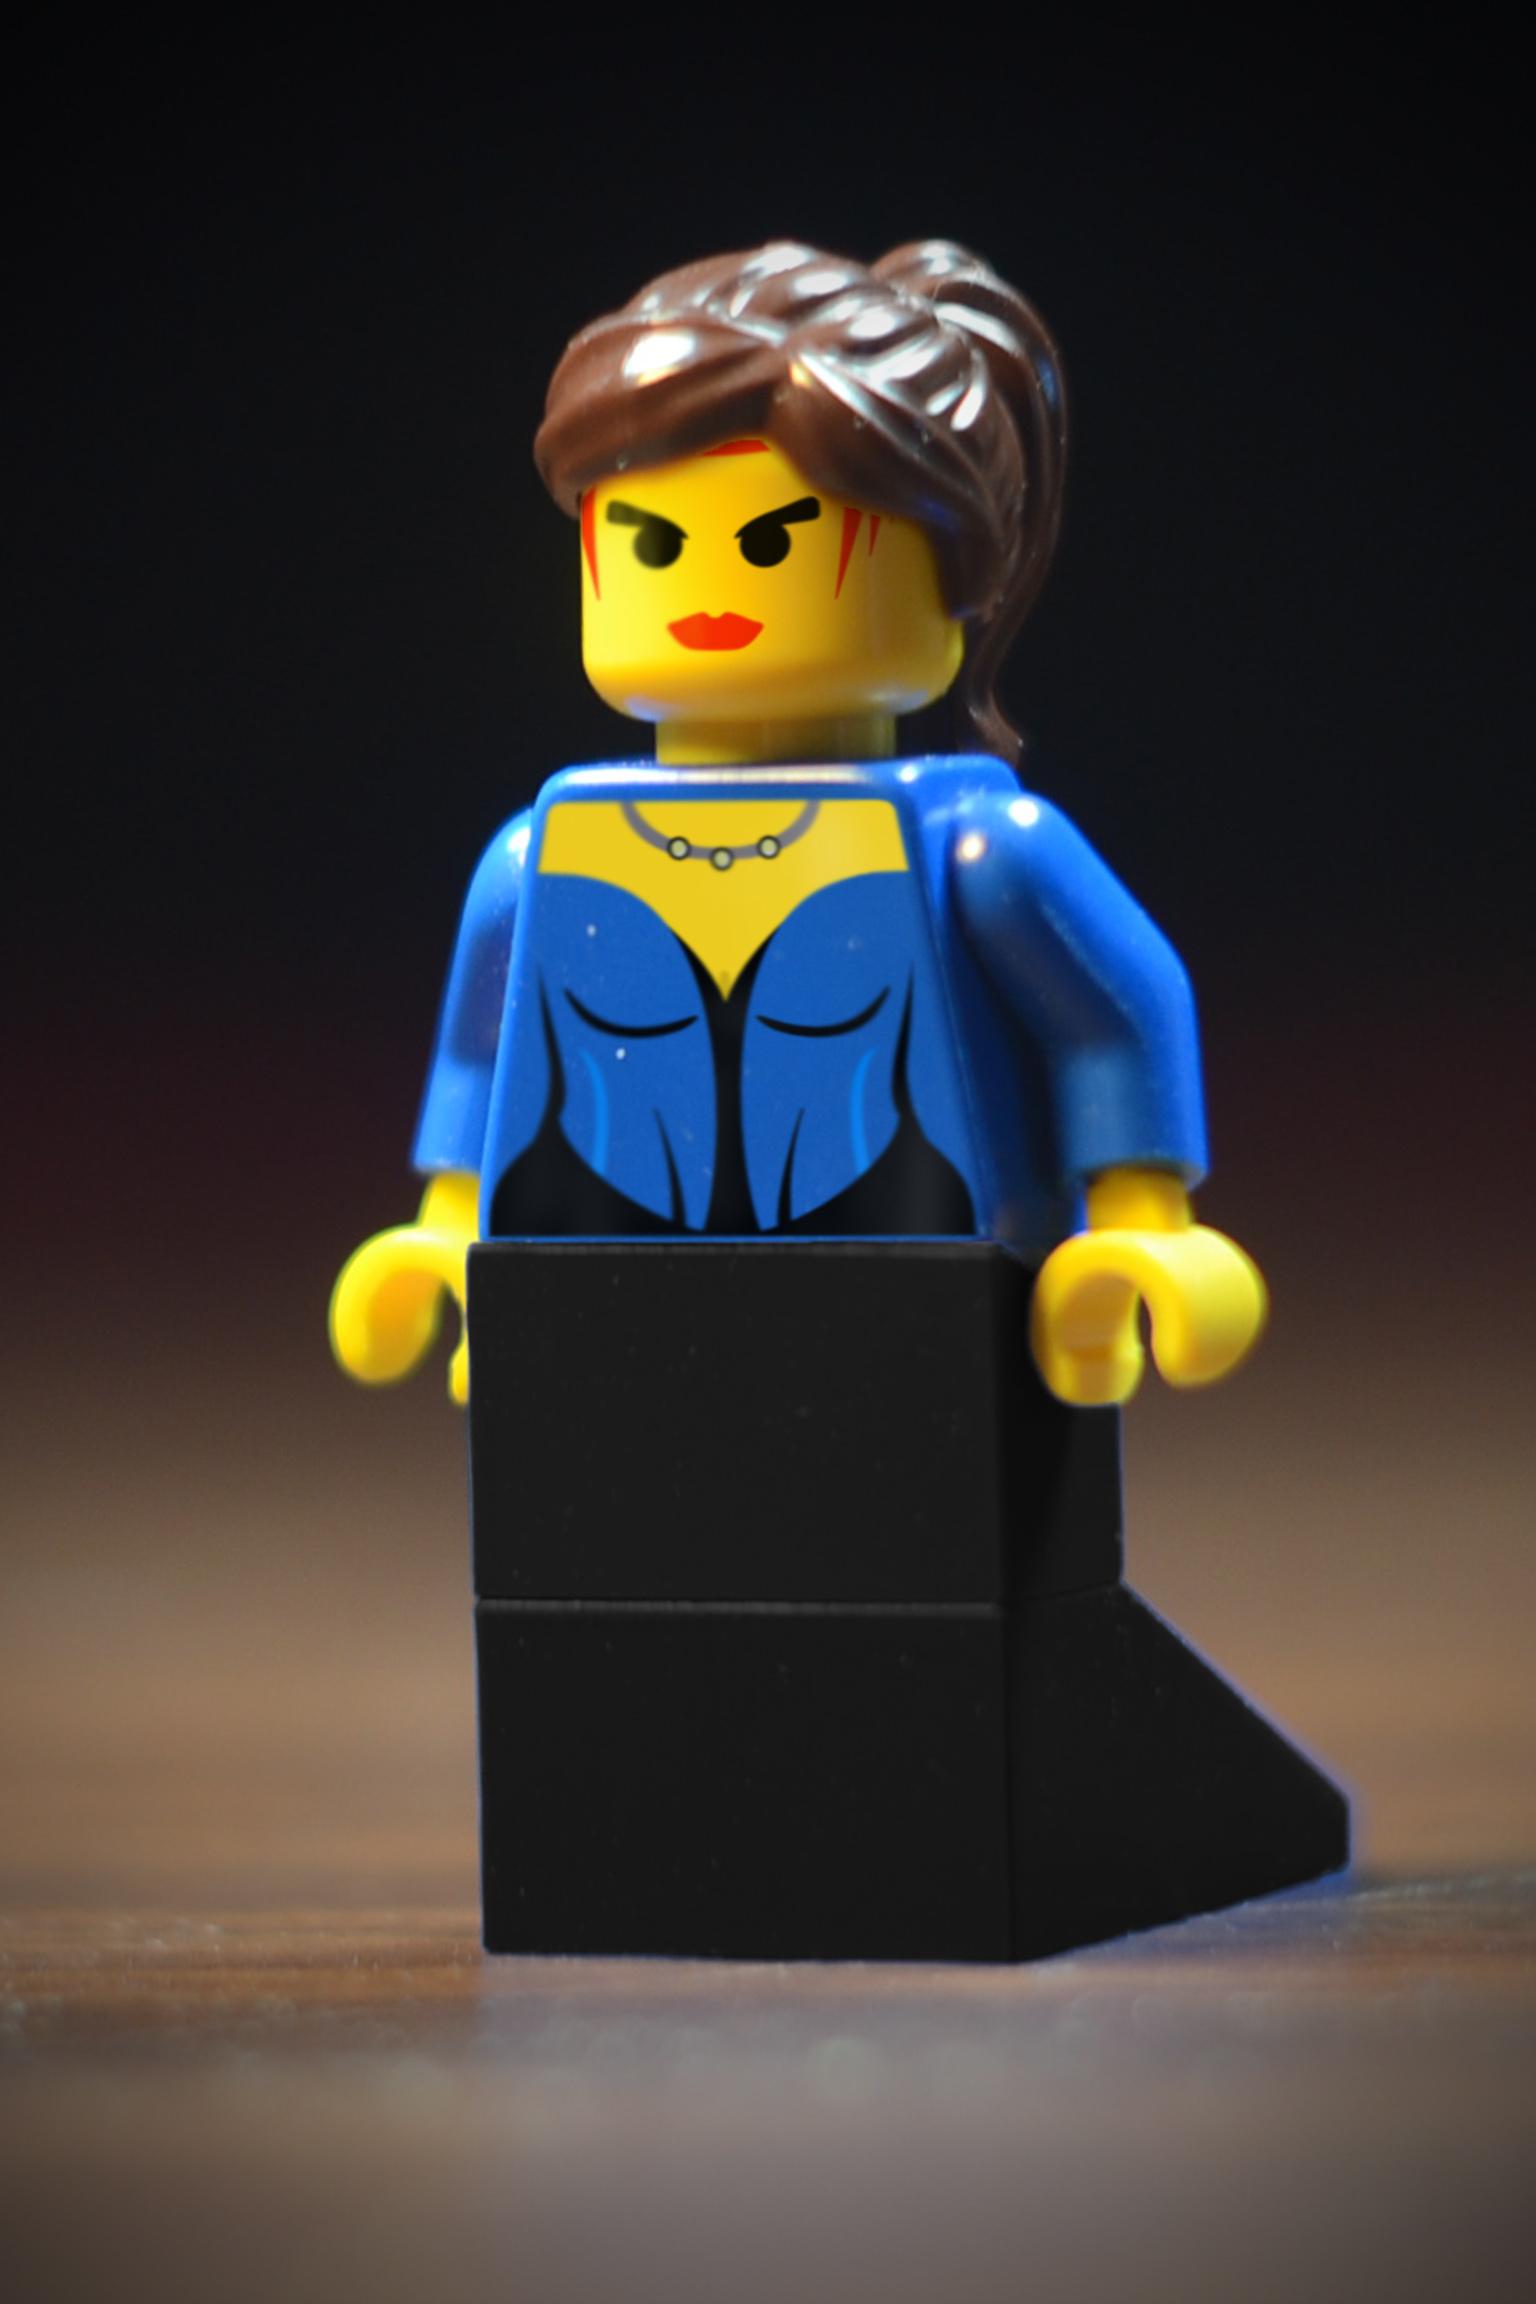 http://bricksafe.com/files/rioforce/Minifigures/Princess%20Storm/Lady%20Princess%20Storm%20Two.jpg